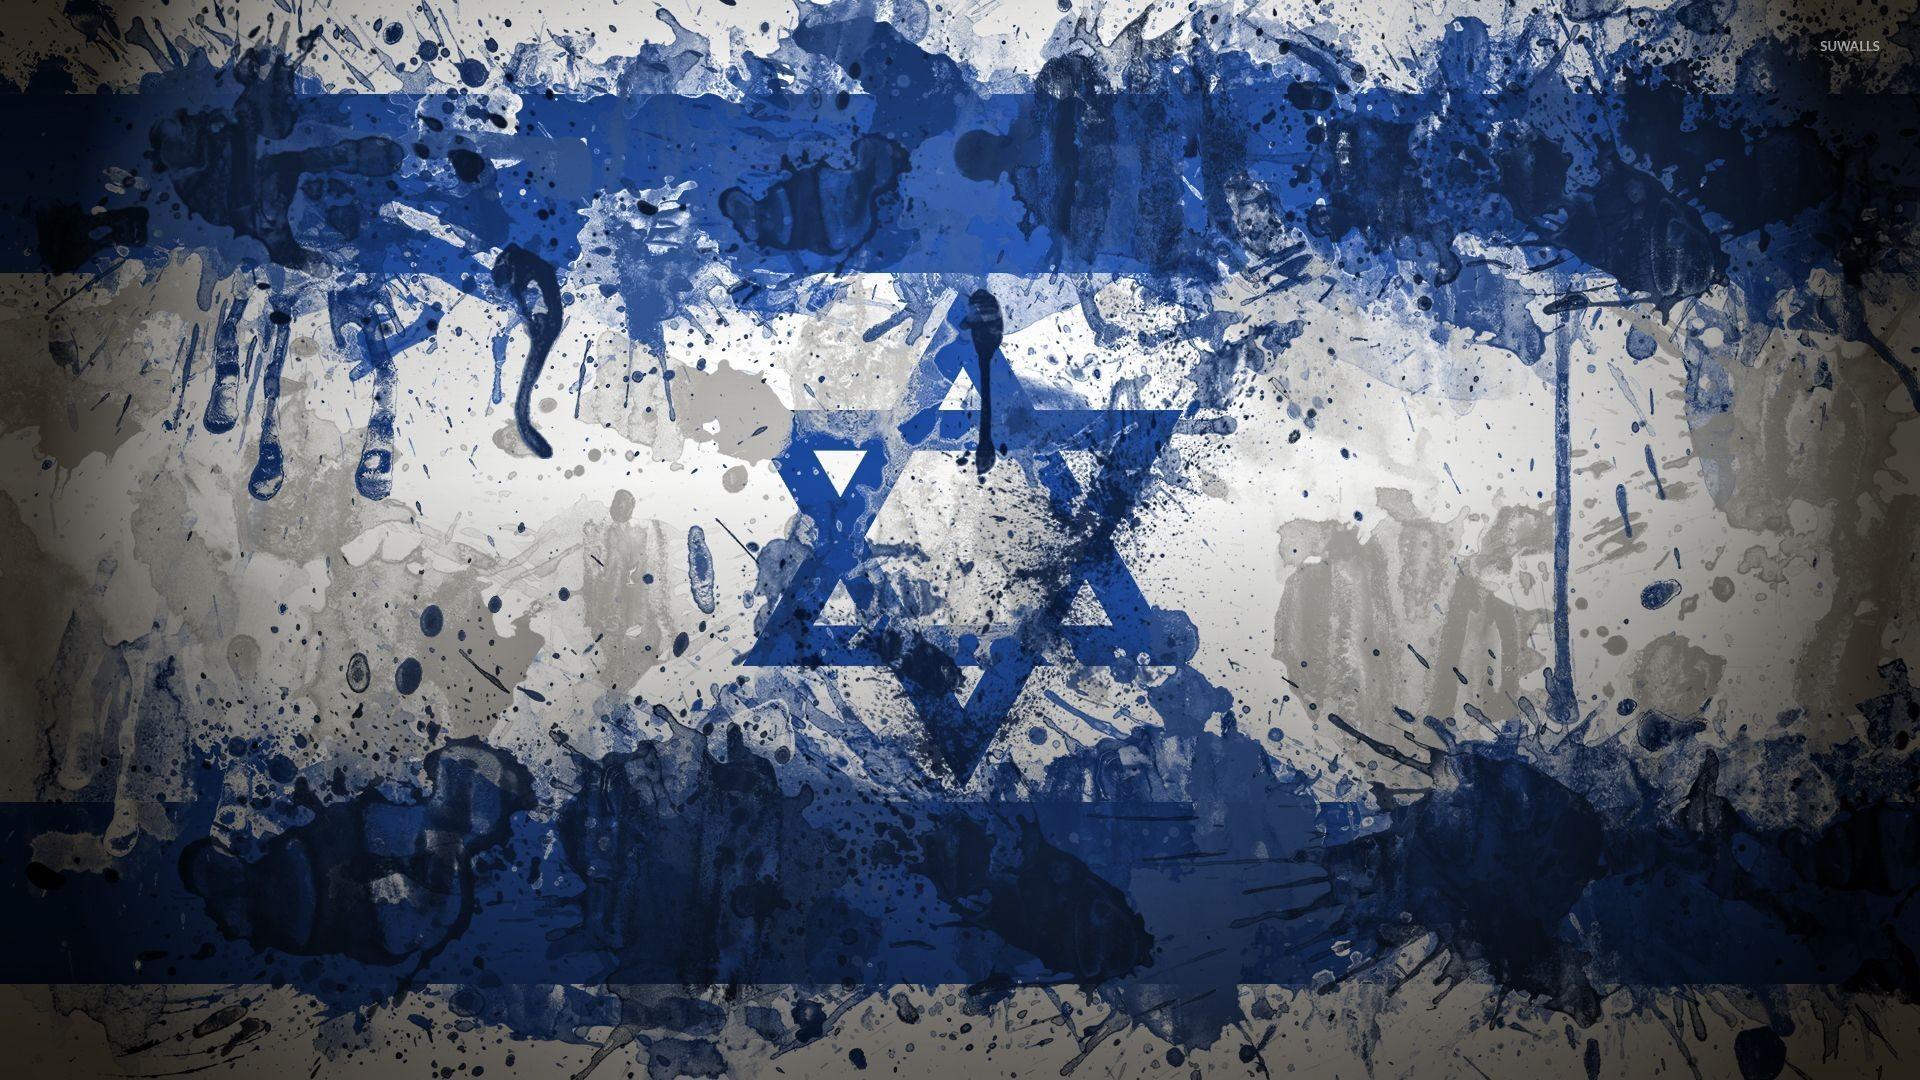 Flag of Israel wallpaper – Digital Art wallpapers – #28180